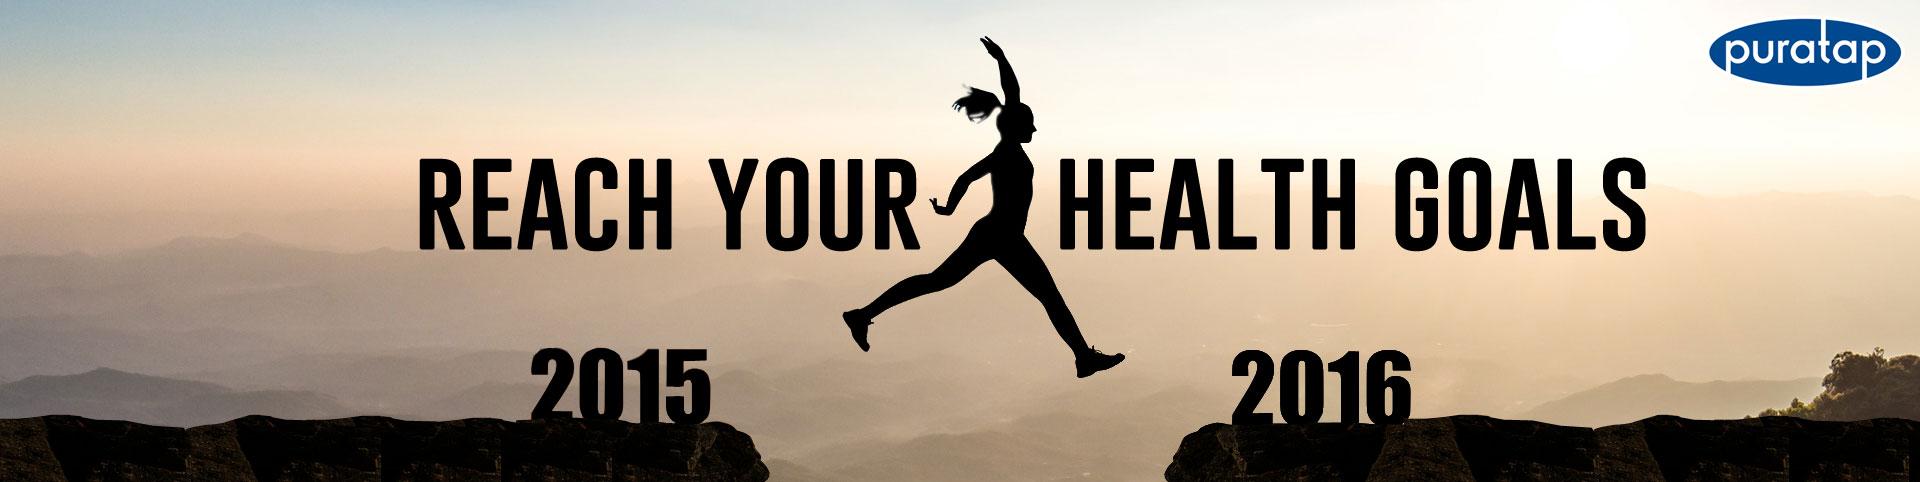 Reach your health goal with puratap